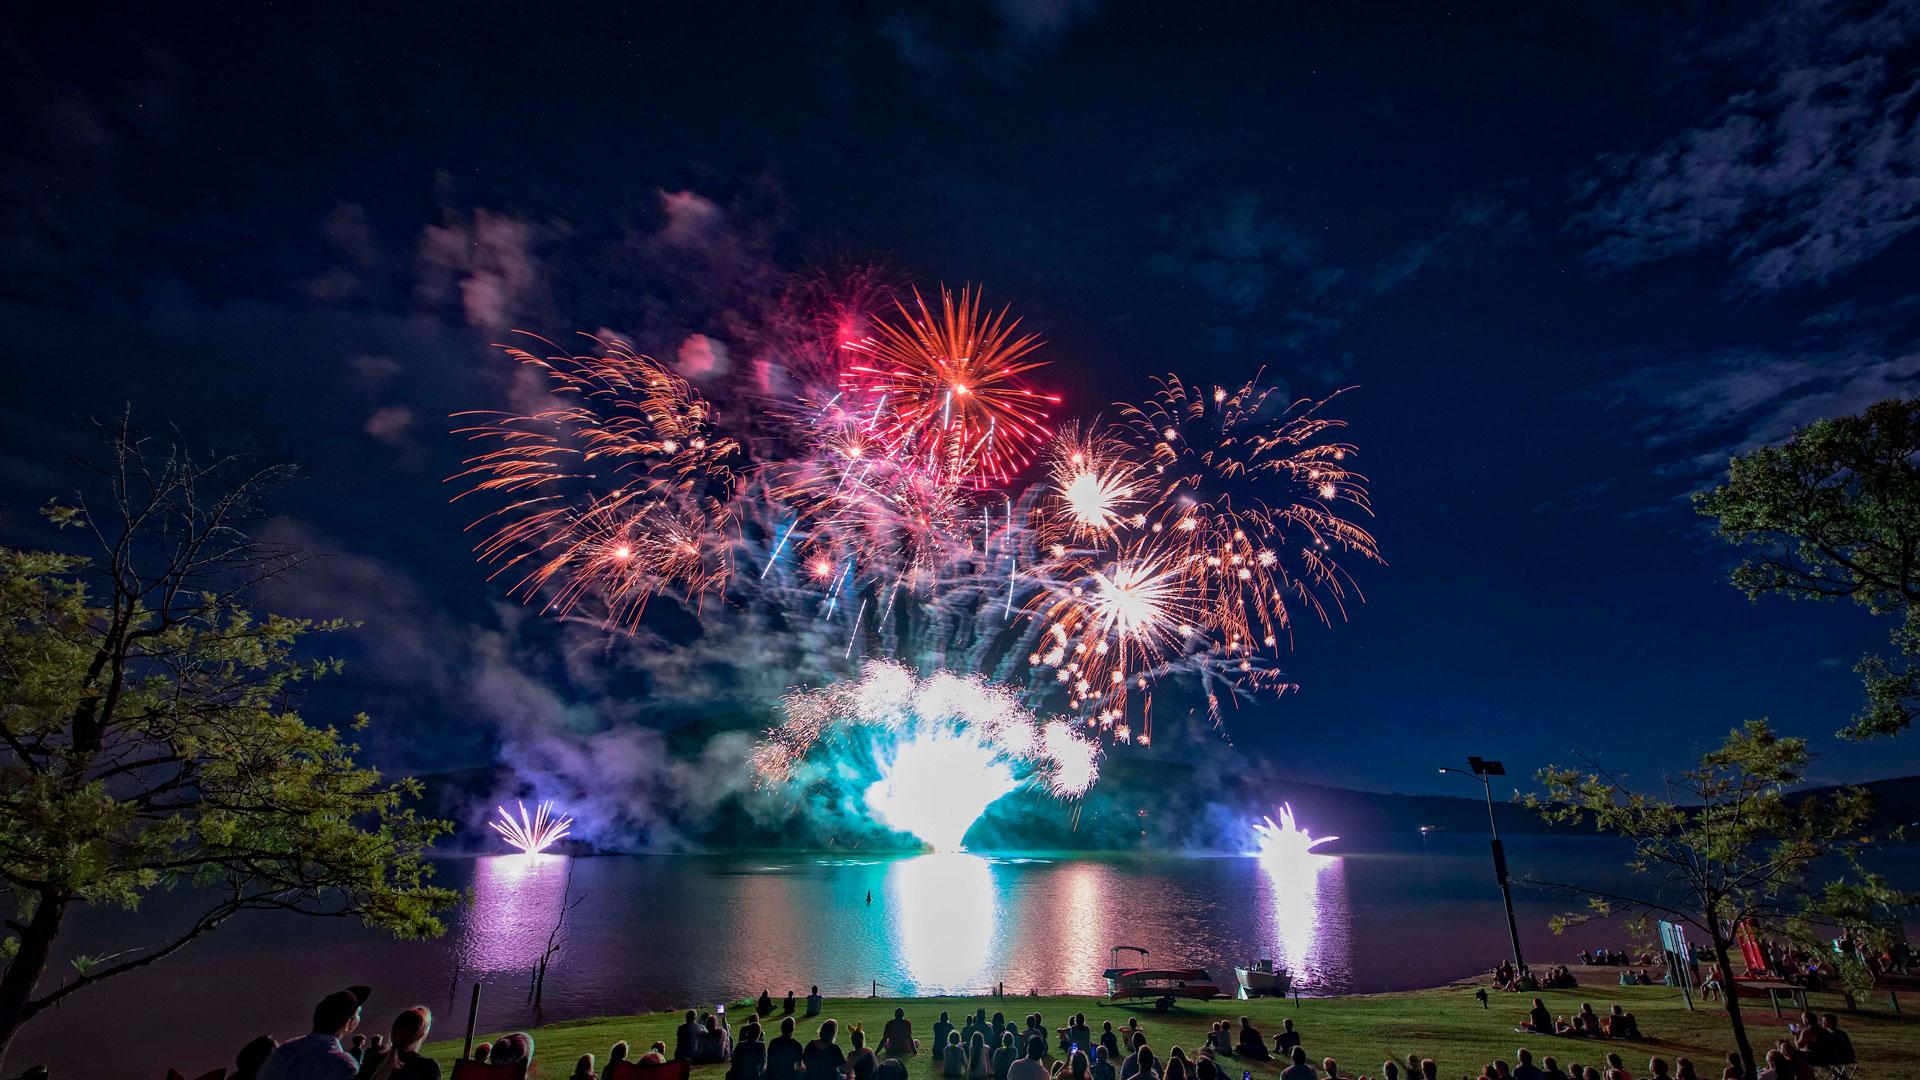 brisbane-fireworks-all-fired-up-fireworks-stage-fx-ipswich-home-slide-2018-2